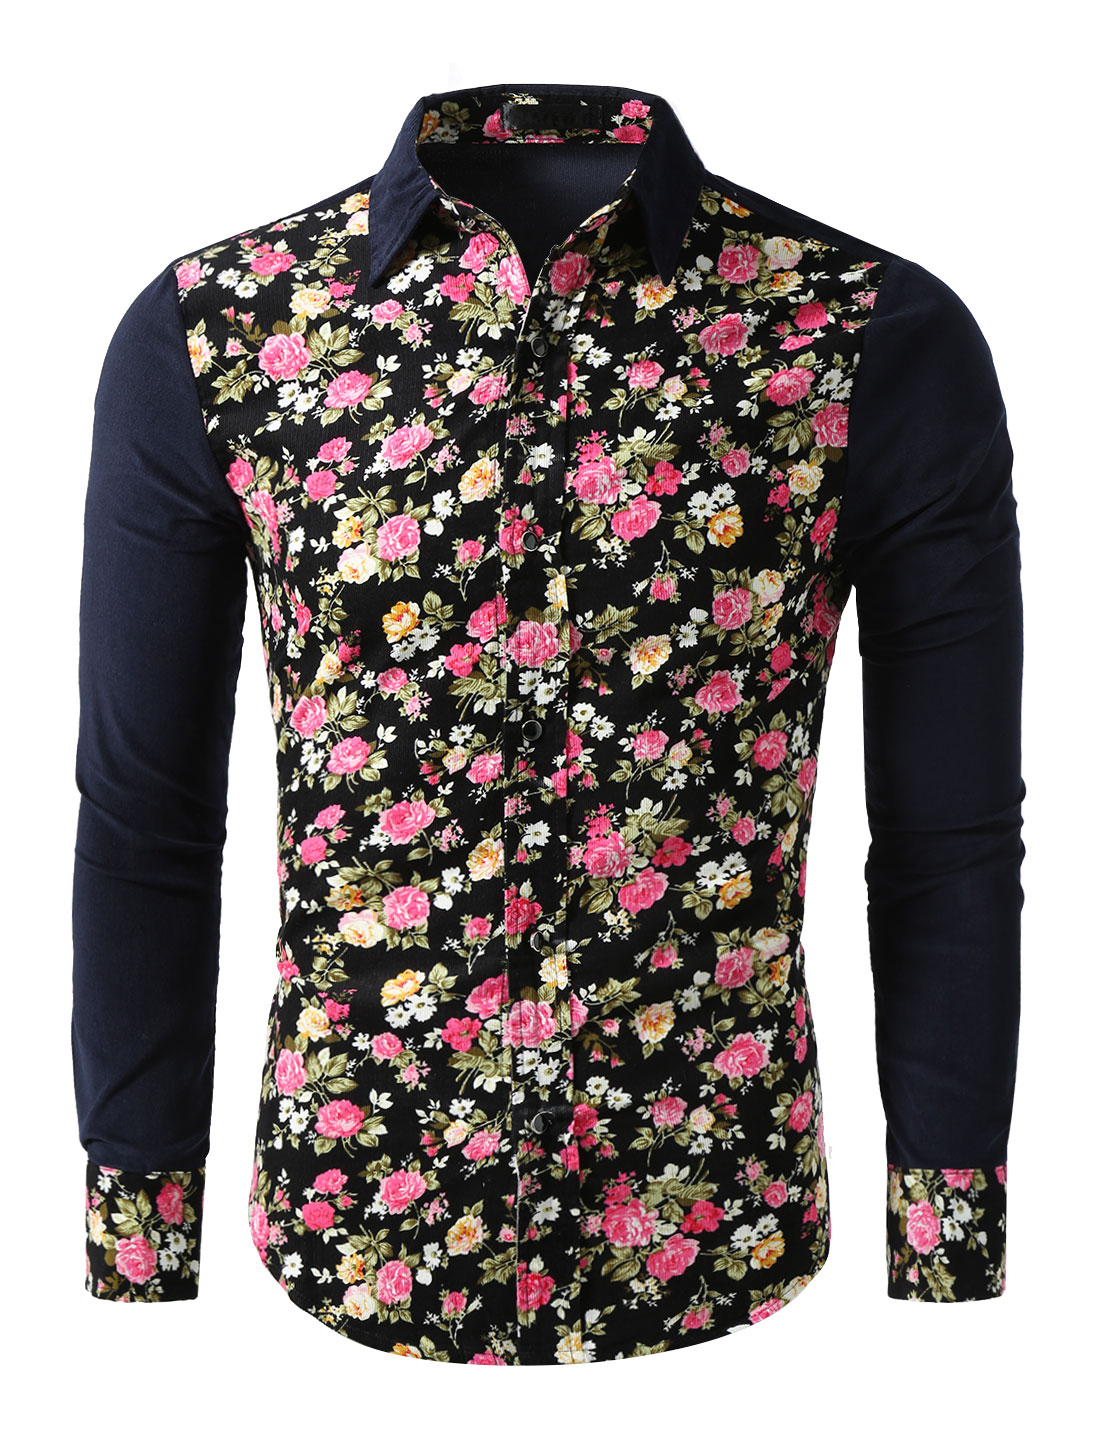 Men Long Sleeves Flower Print Corduroy Collared Shirts Black M